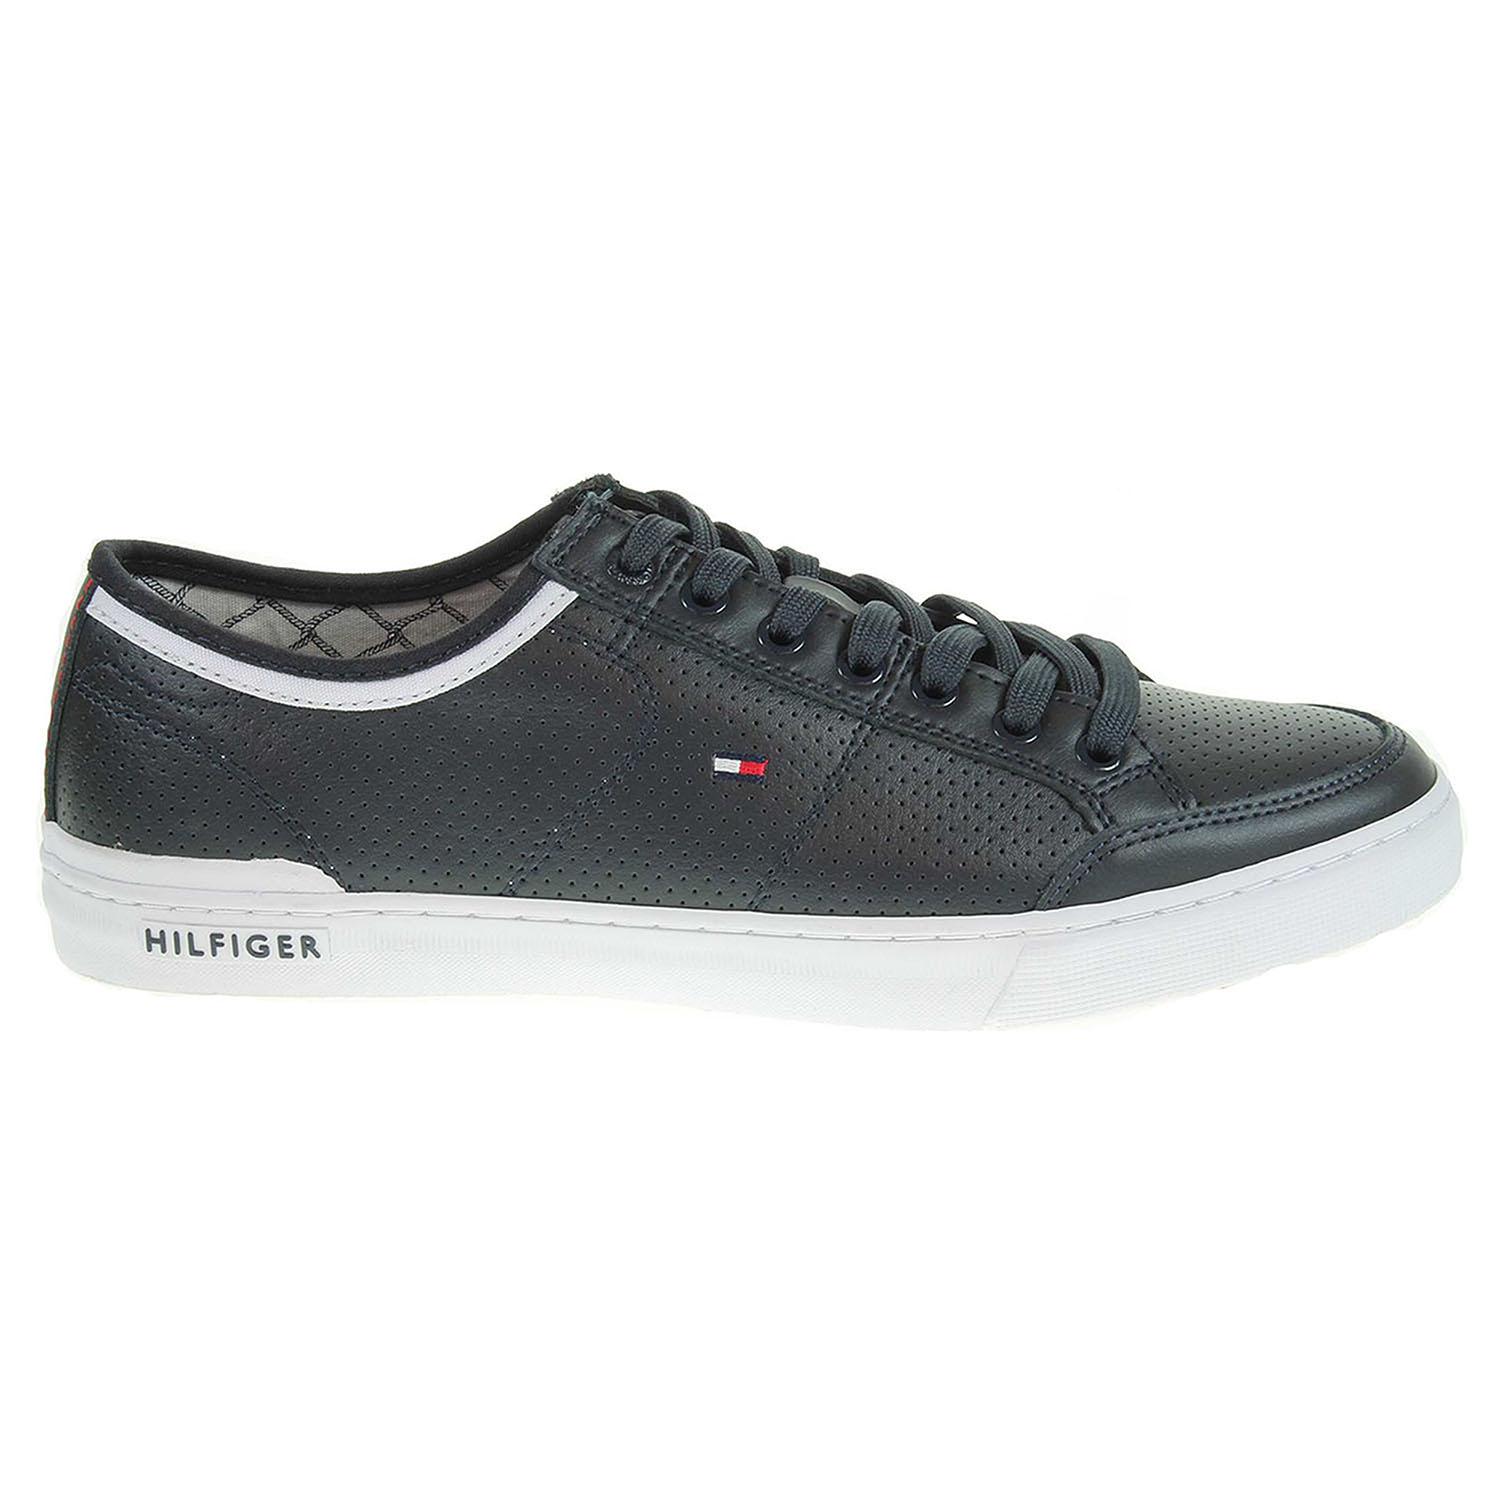 Ecco Tommy Hilfiger pánská obuv FM0FM00552 H2285ARRINGTON 5A modrá 24000447